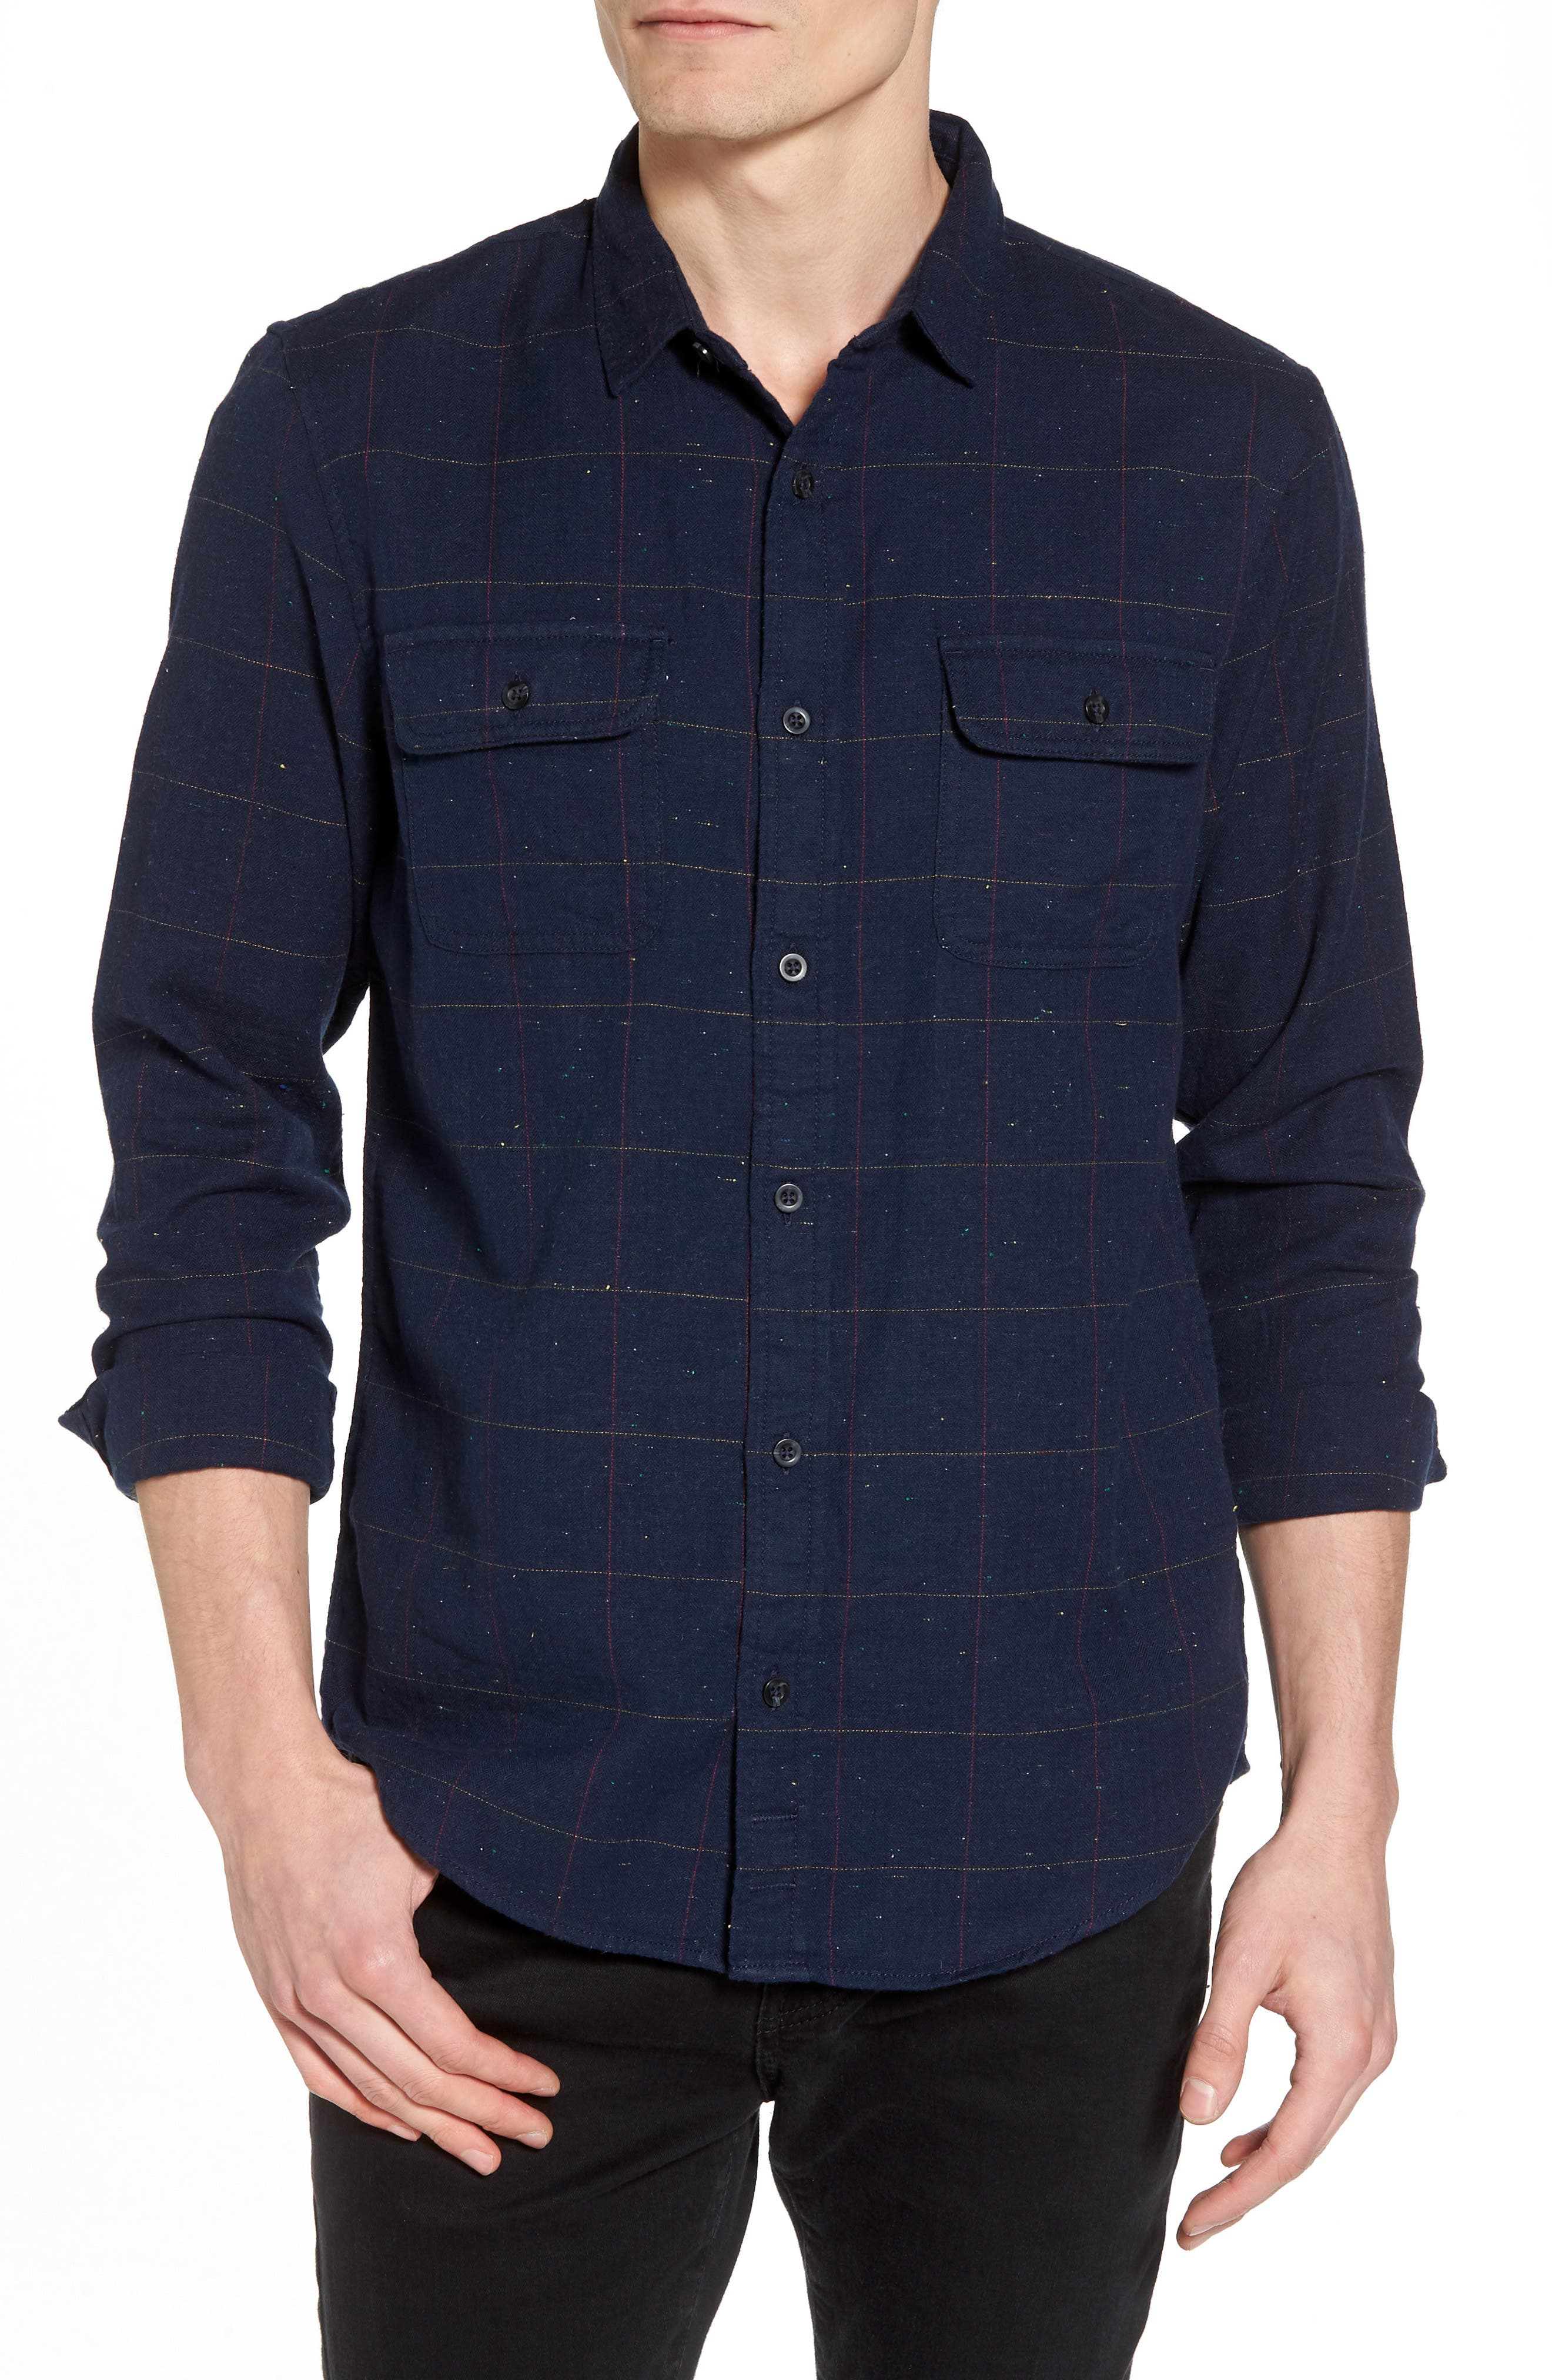 Herringbone Plaid Flannel Shirt,                         Main,                         color, Black - White Nepped Tartan